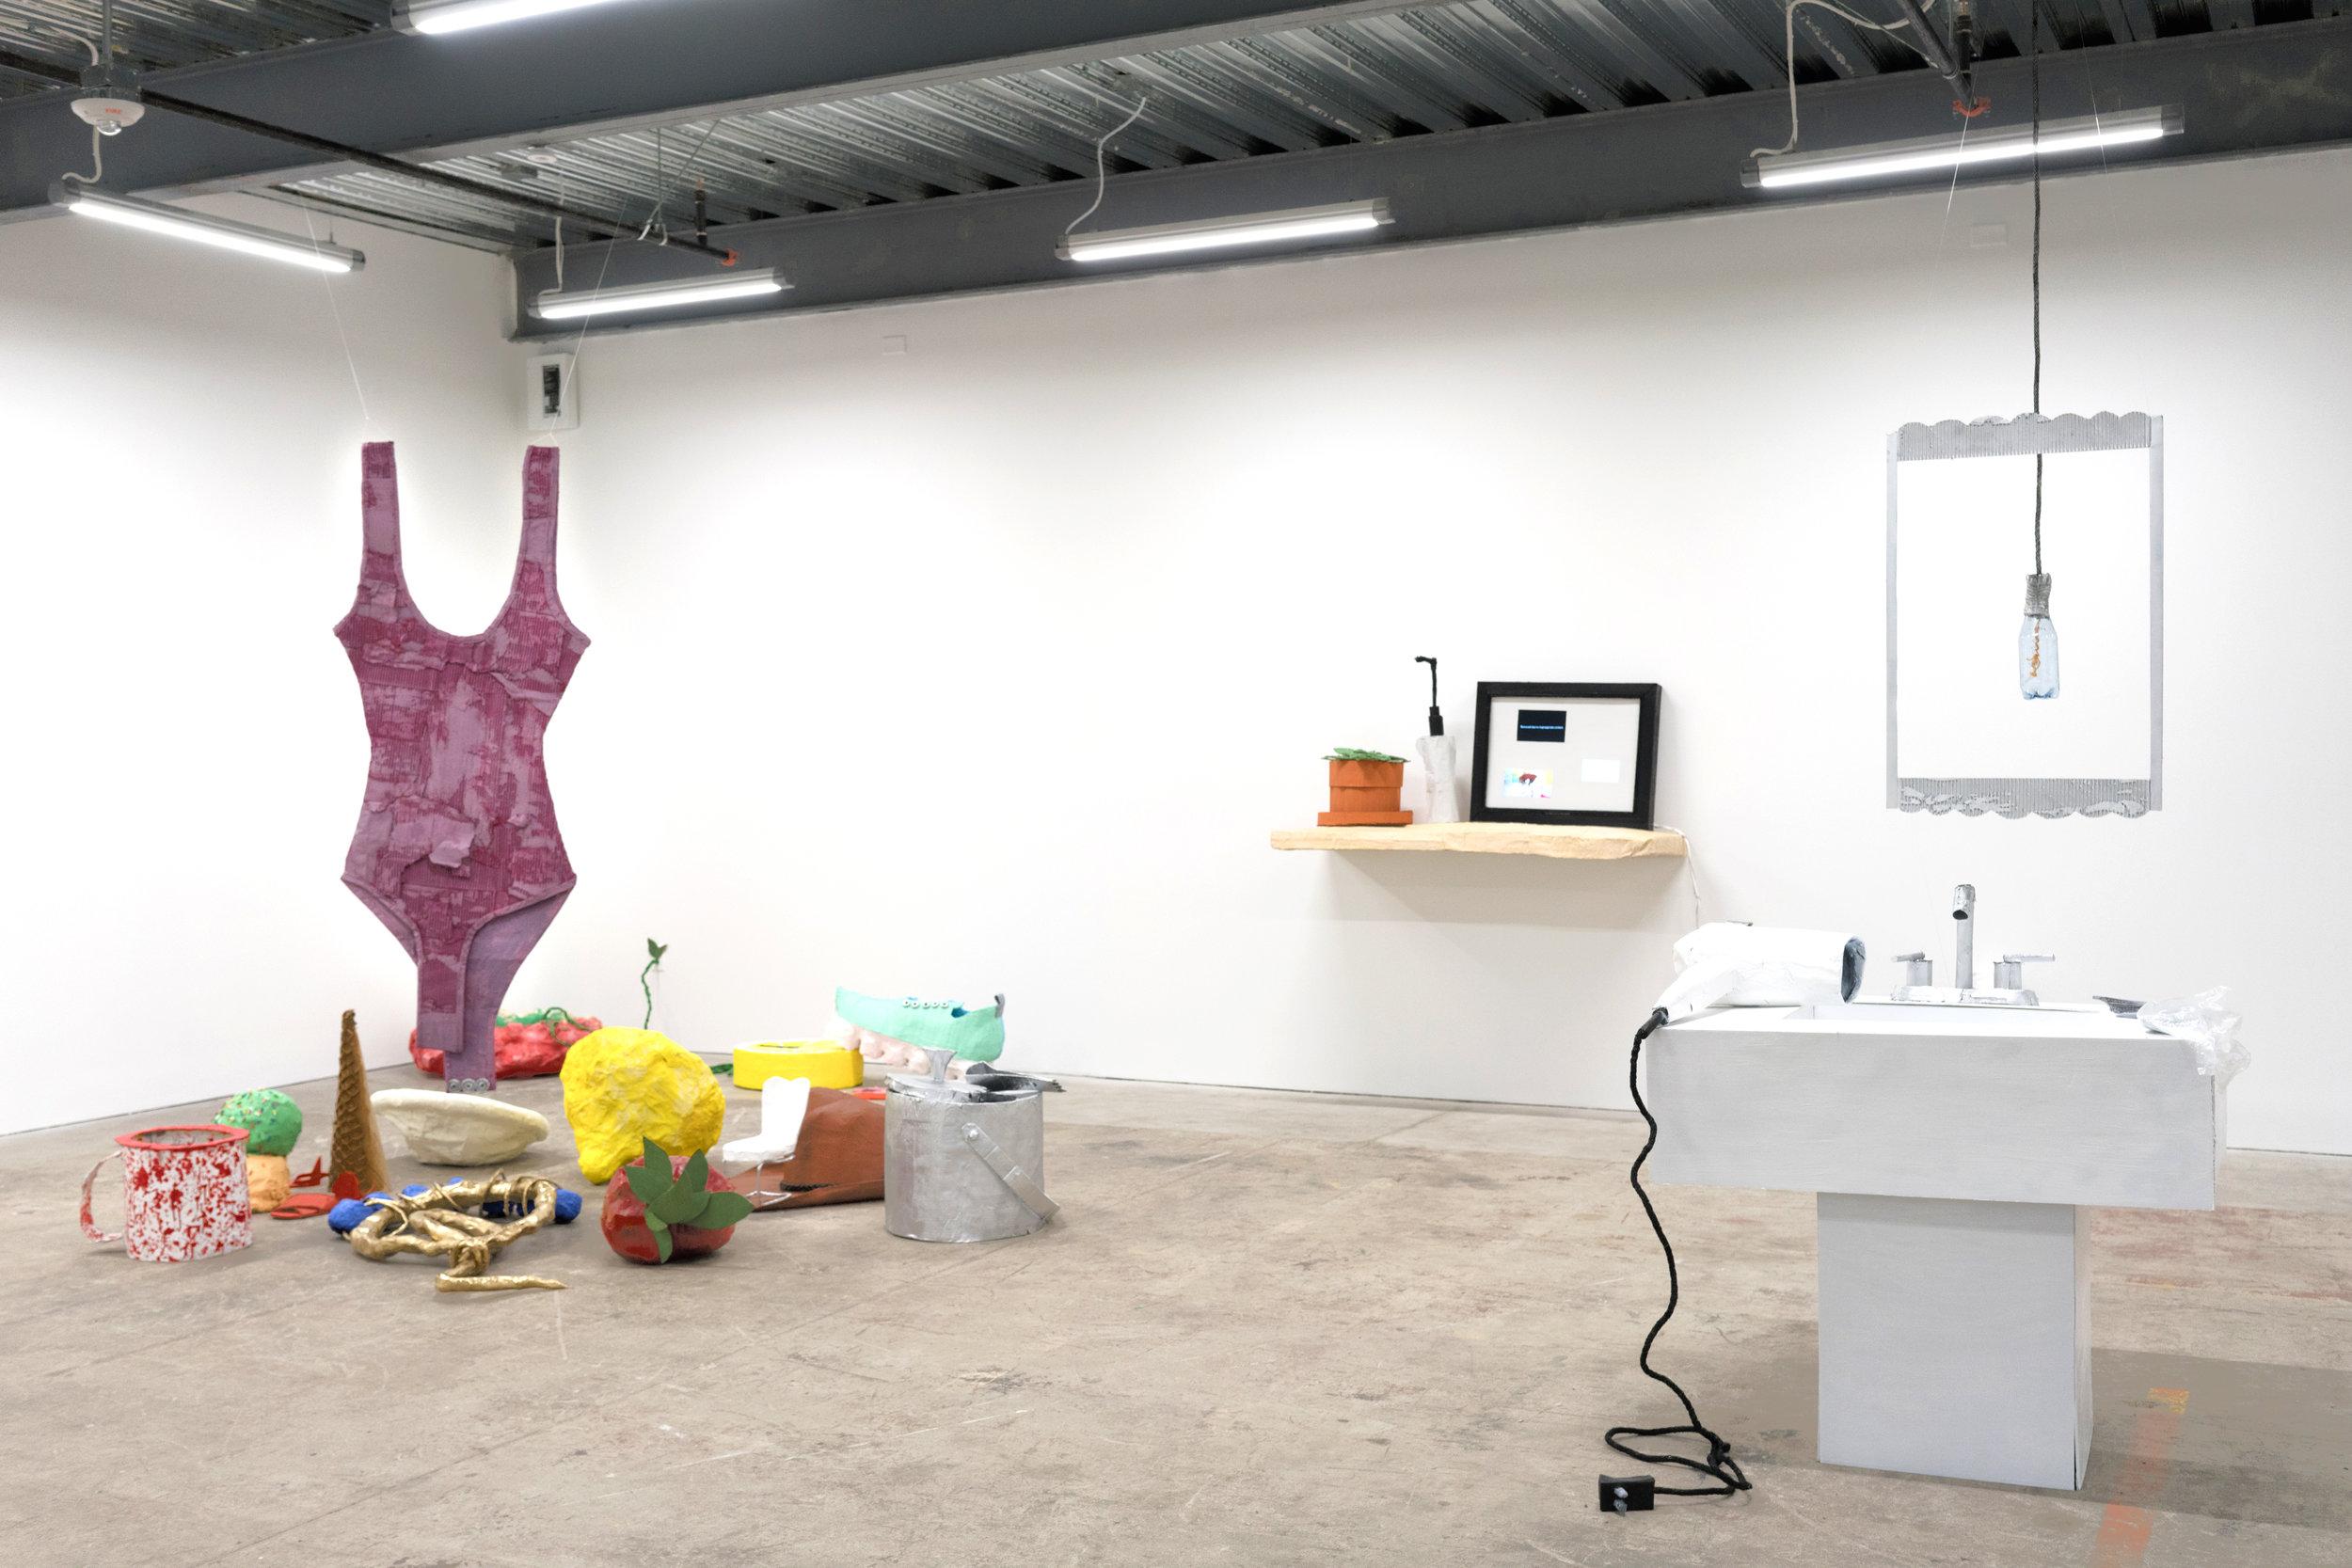 Personal Optimization  , intermedia installation: sculpture and video, 2018 at Minnesota Street Project. San Francisco, CA.